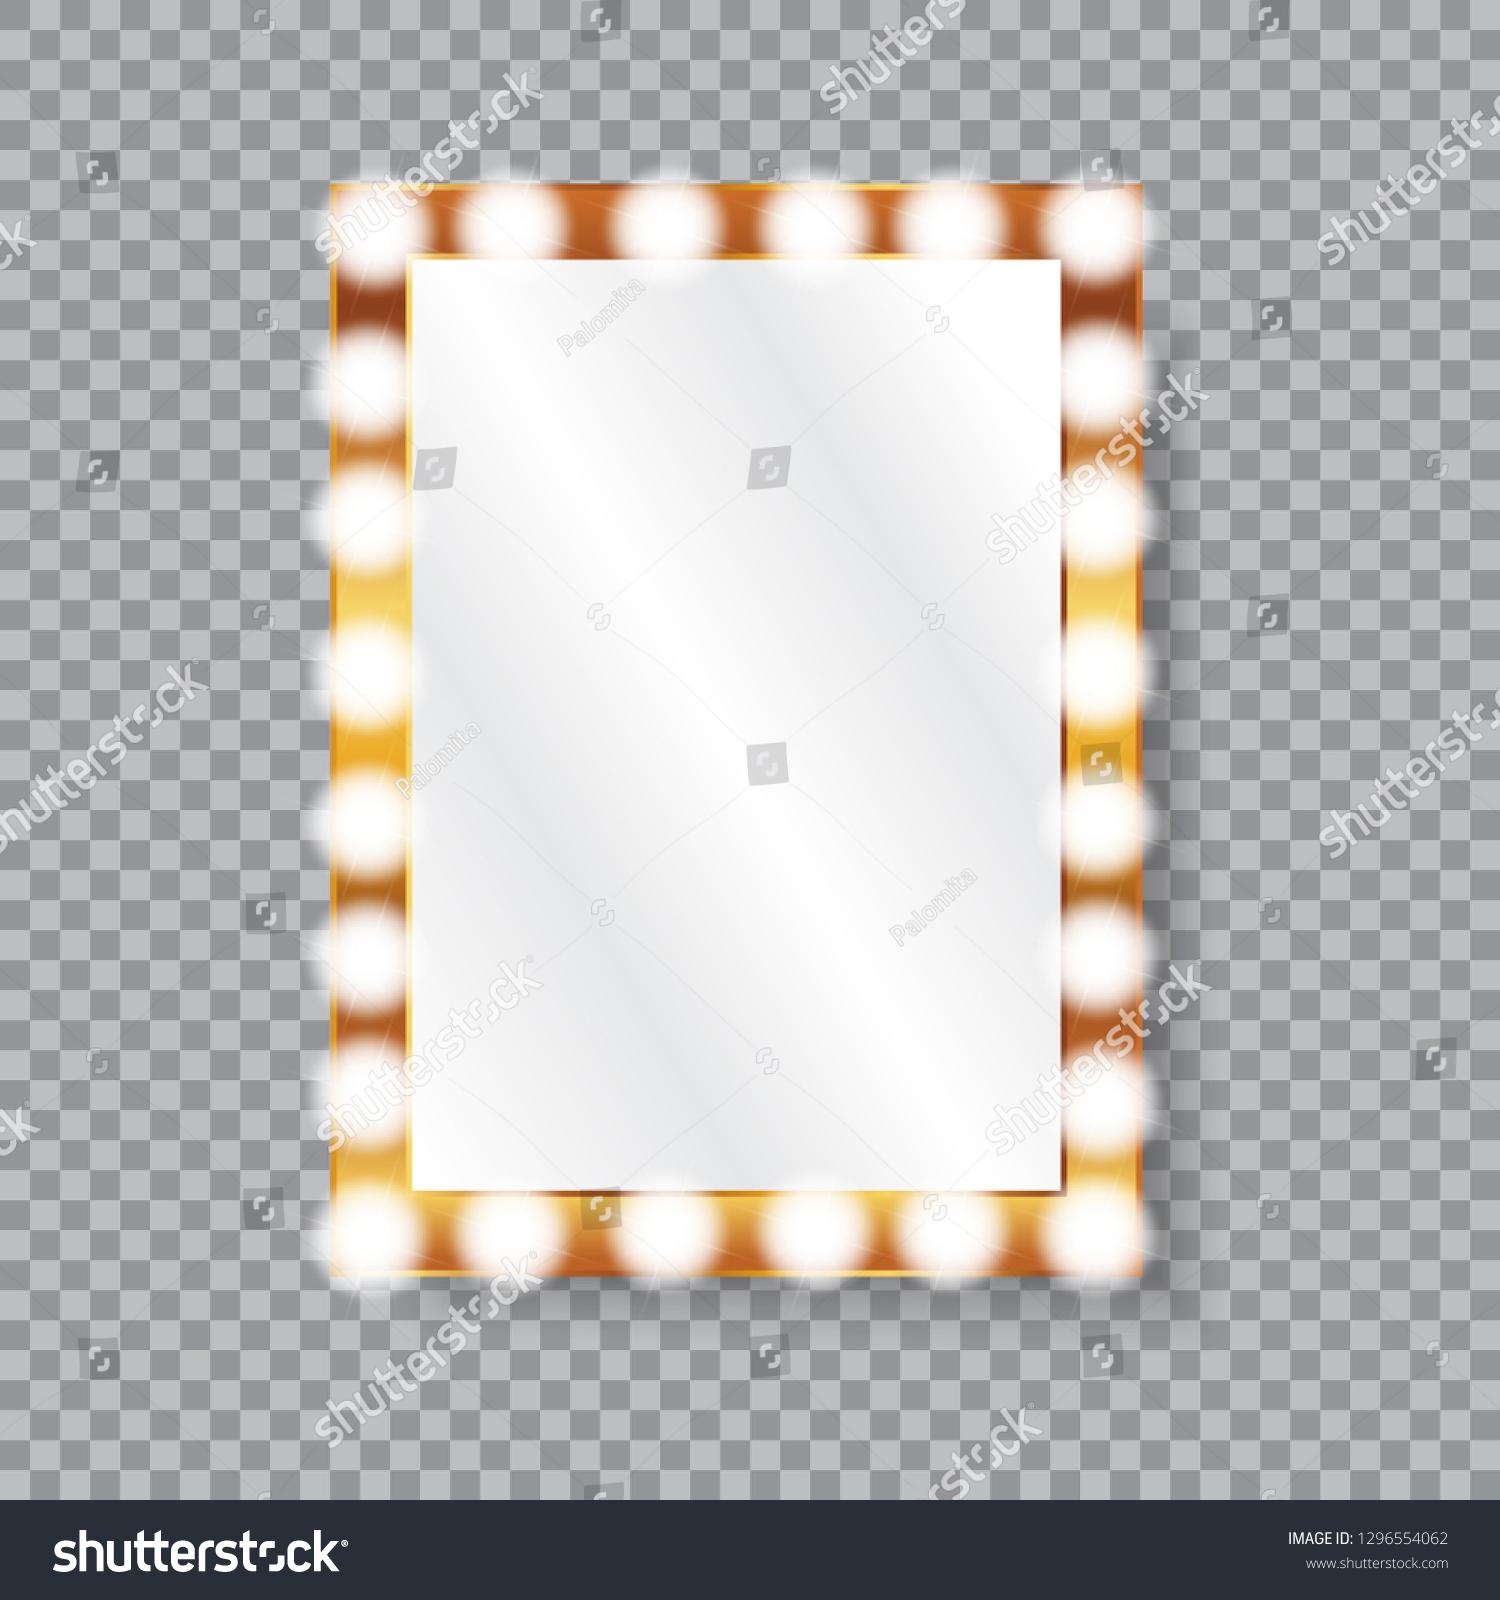 Rectangle Vanity Mirror Light Bulbs Golden Stock Vector Royalty Free 1296554062